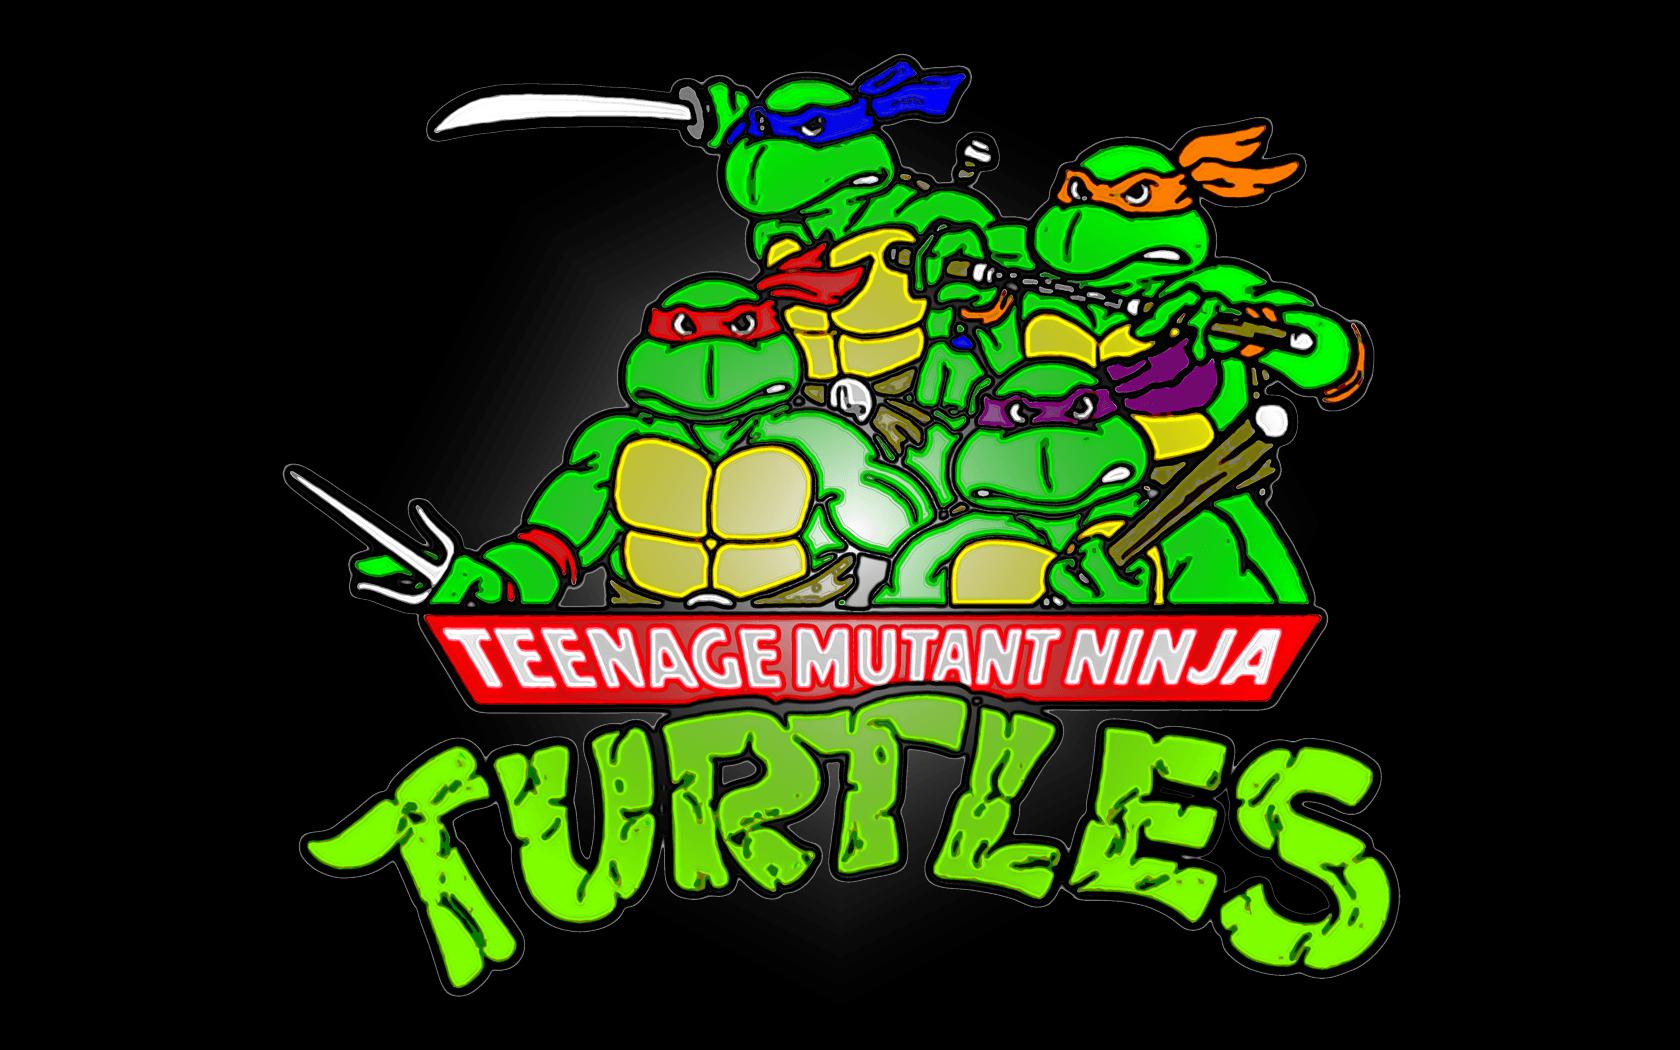 Ninja Turtles Wallpapers - Wallpaper Cave